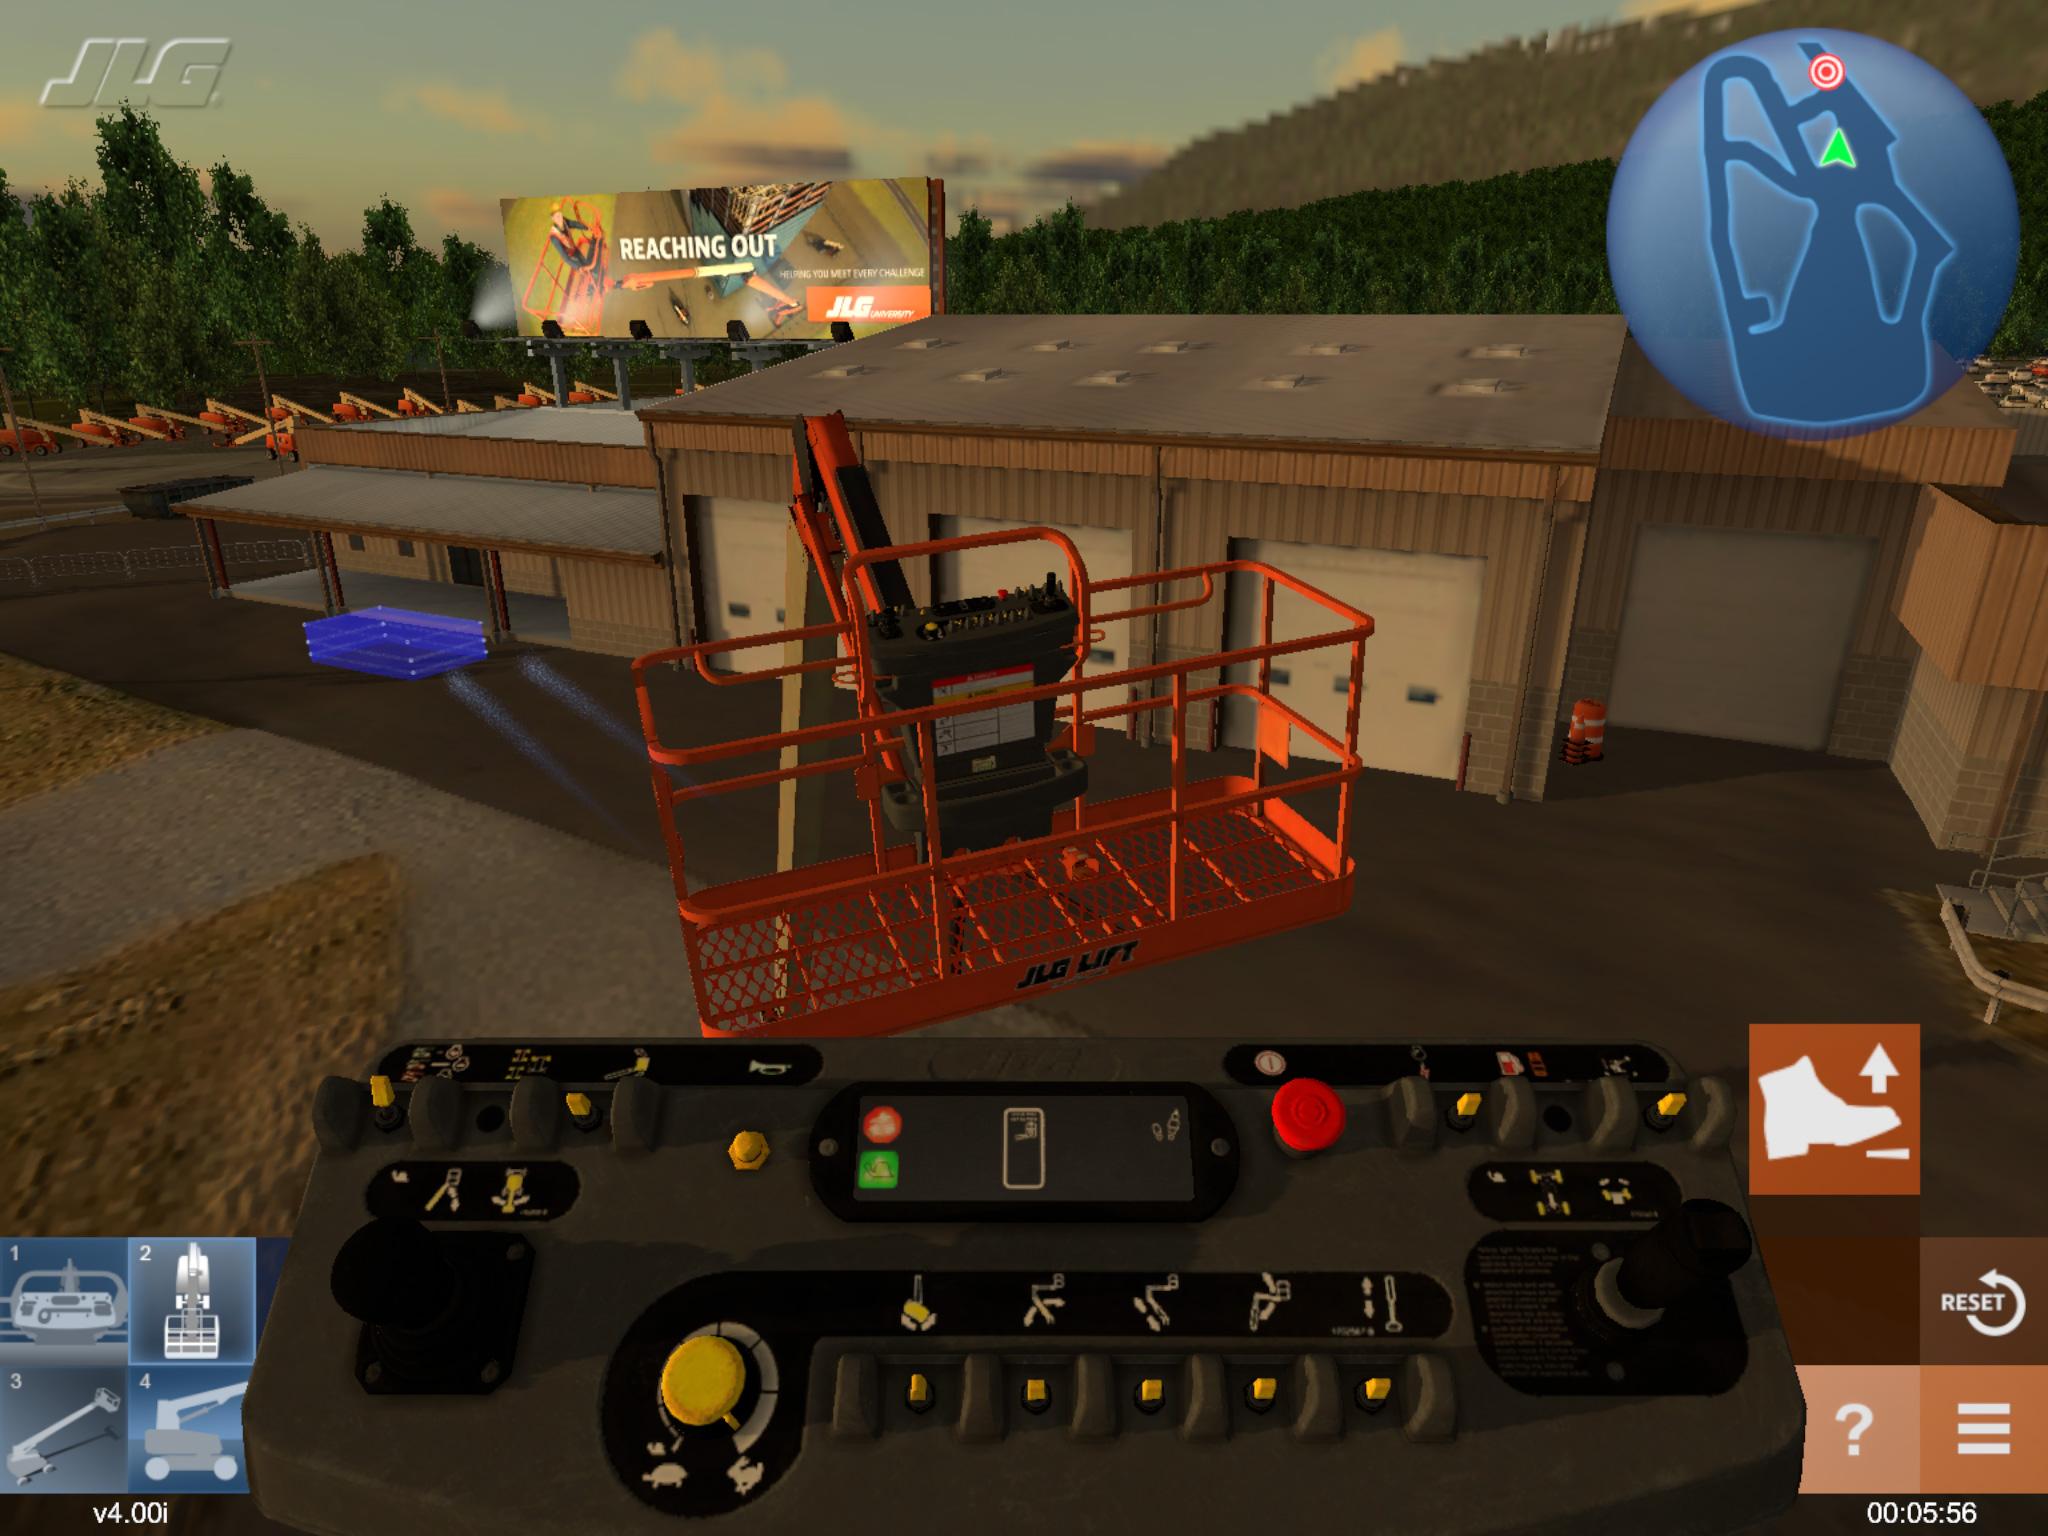 JLG Equipment Operator Training Simulator